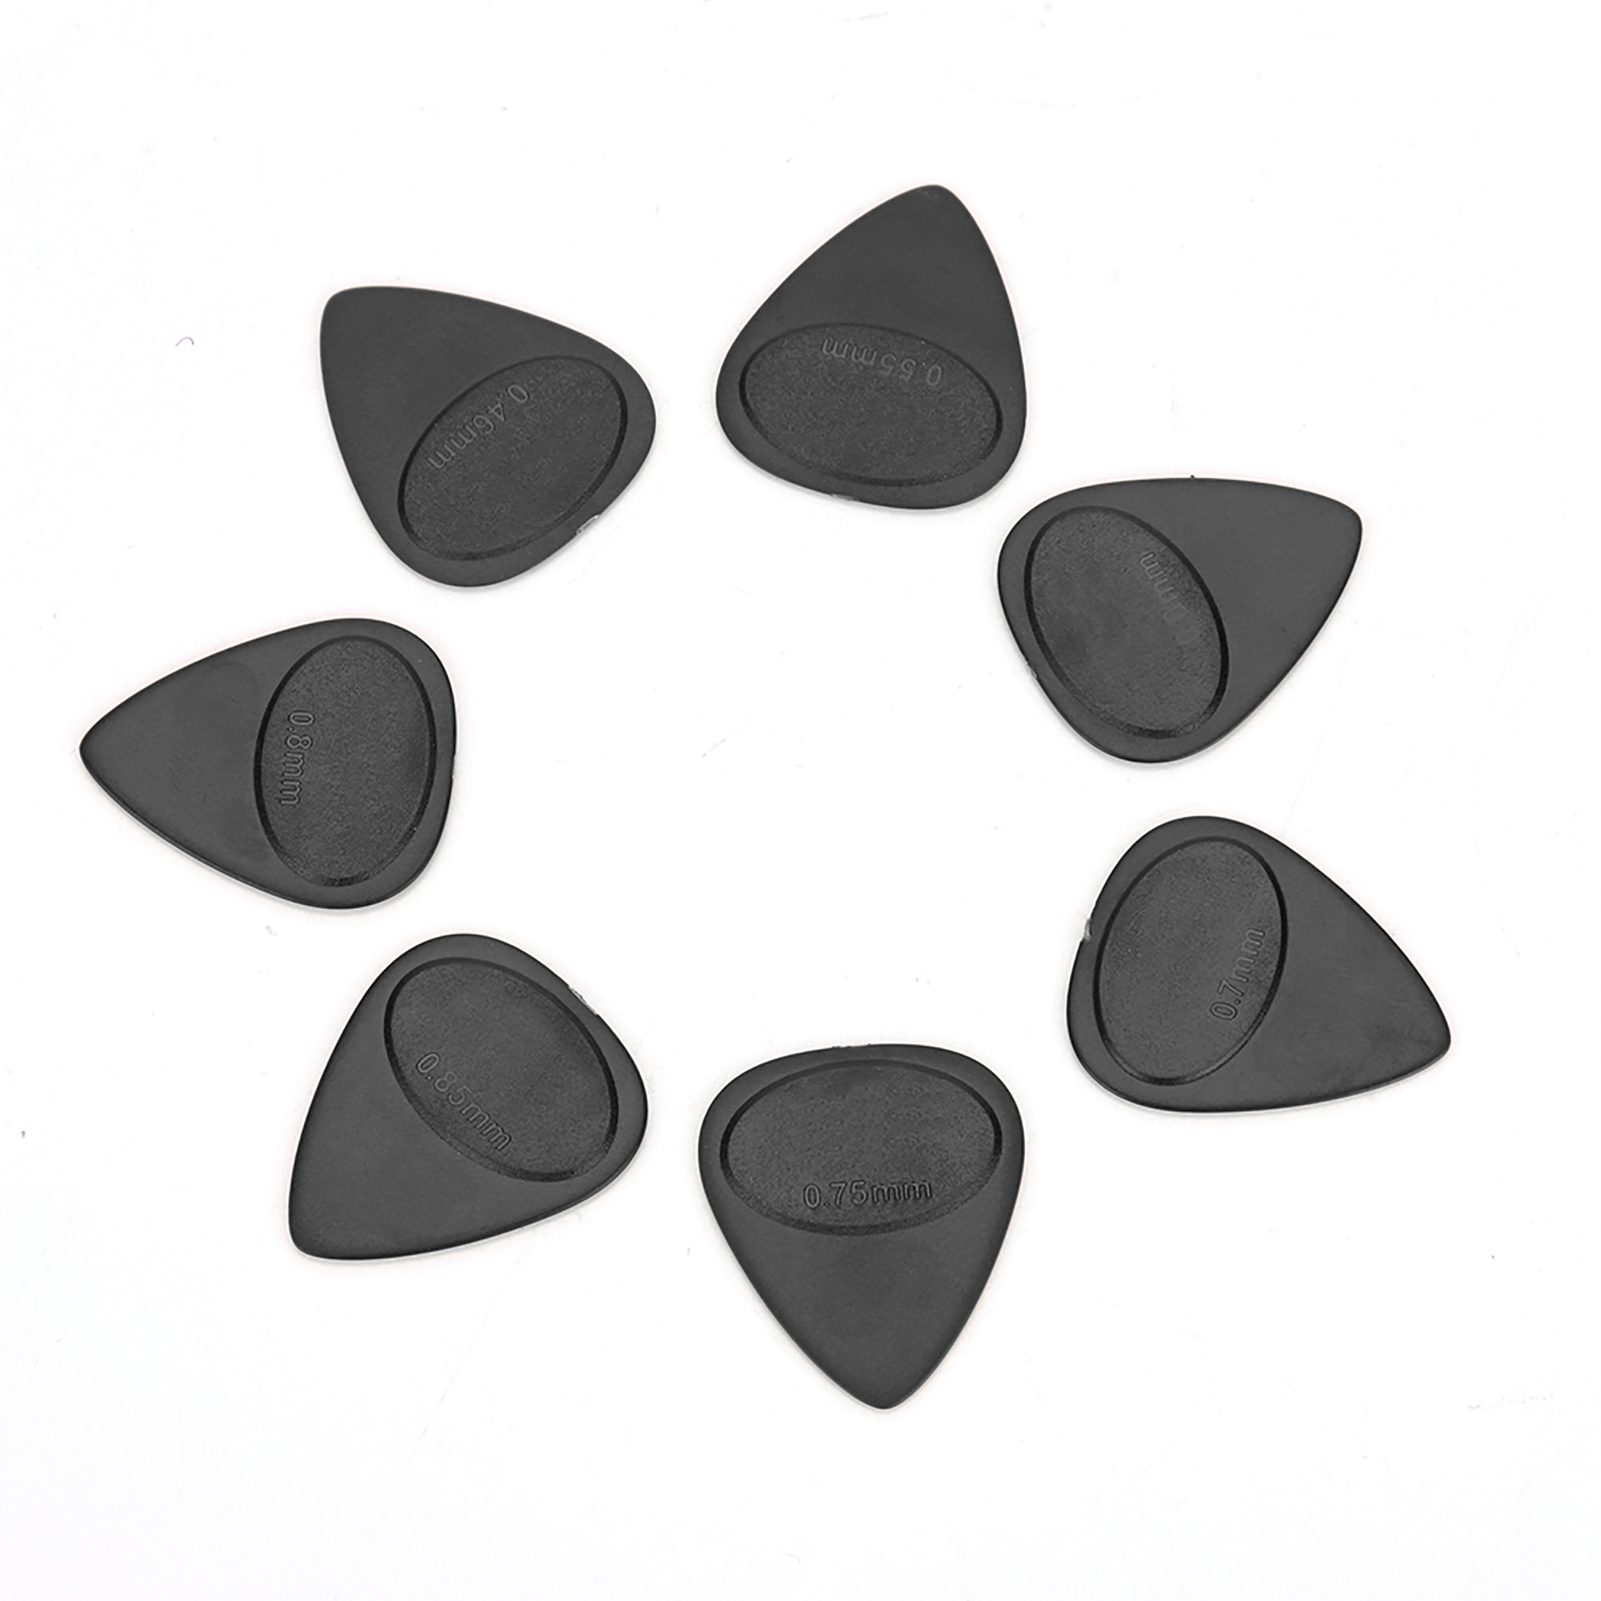 10Pcs-Guitar-Picks-Plectrums-Mediator-Musical-Instrument-Accessories-0-46mm-1mm thumbnail 14